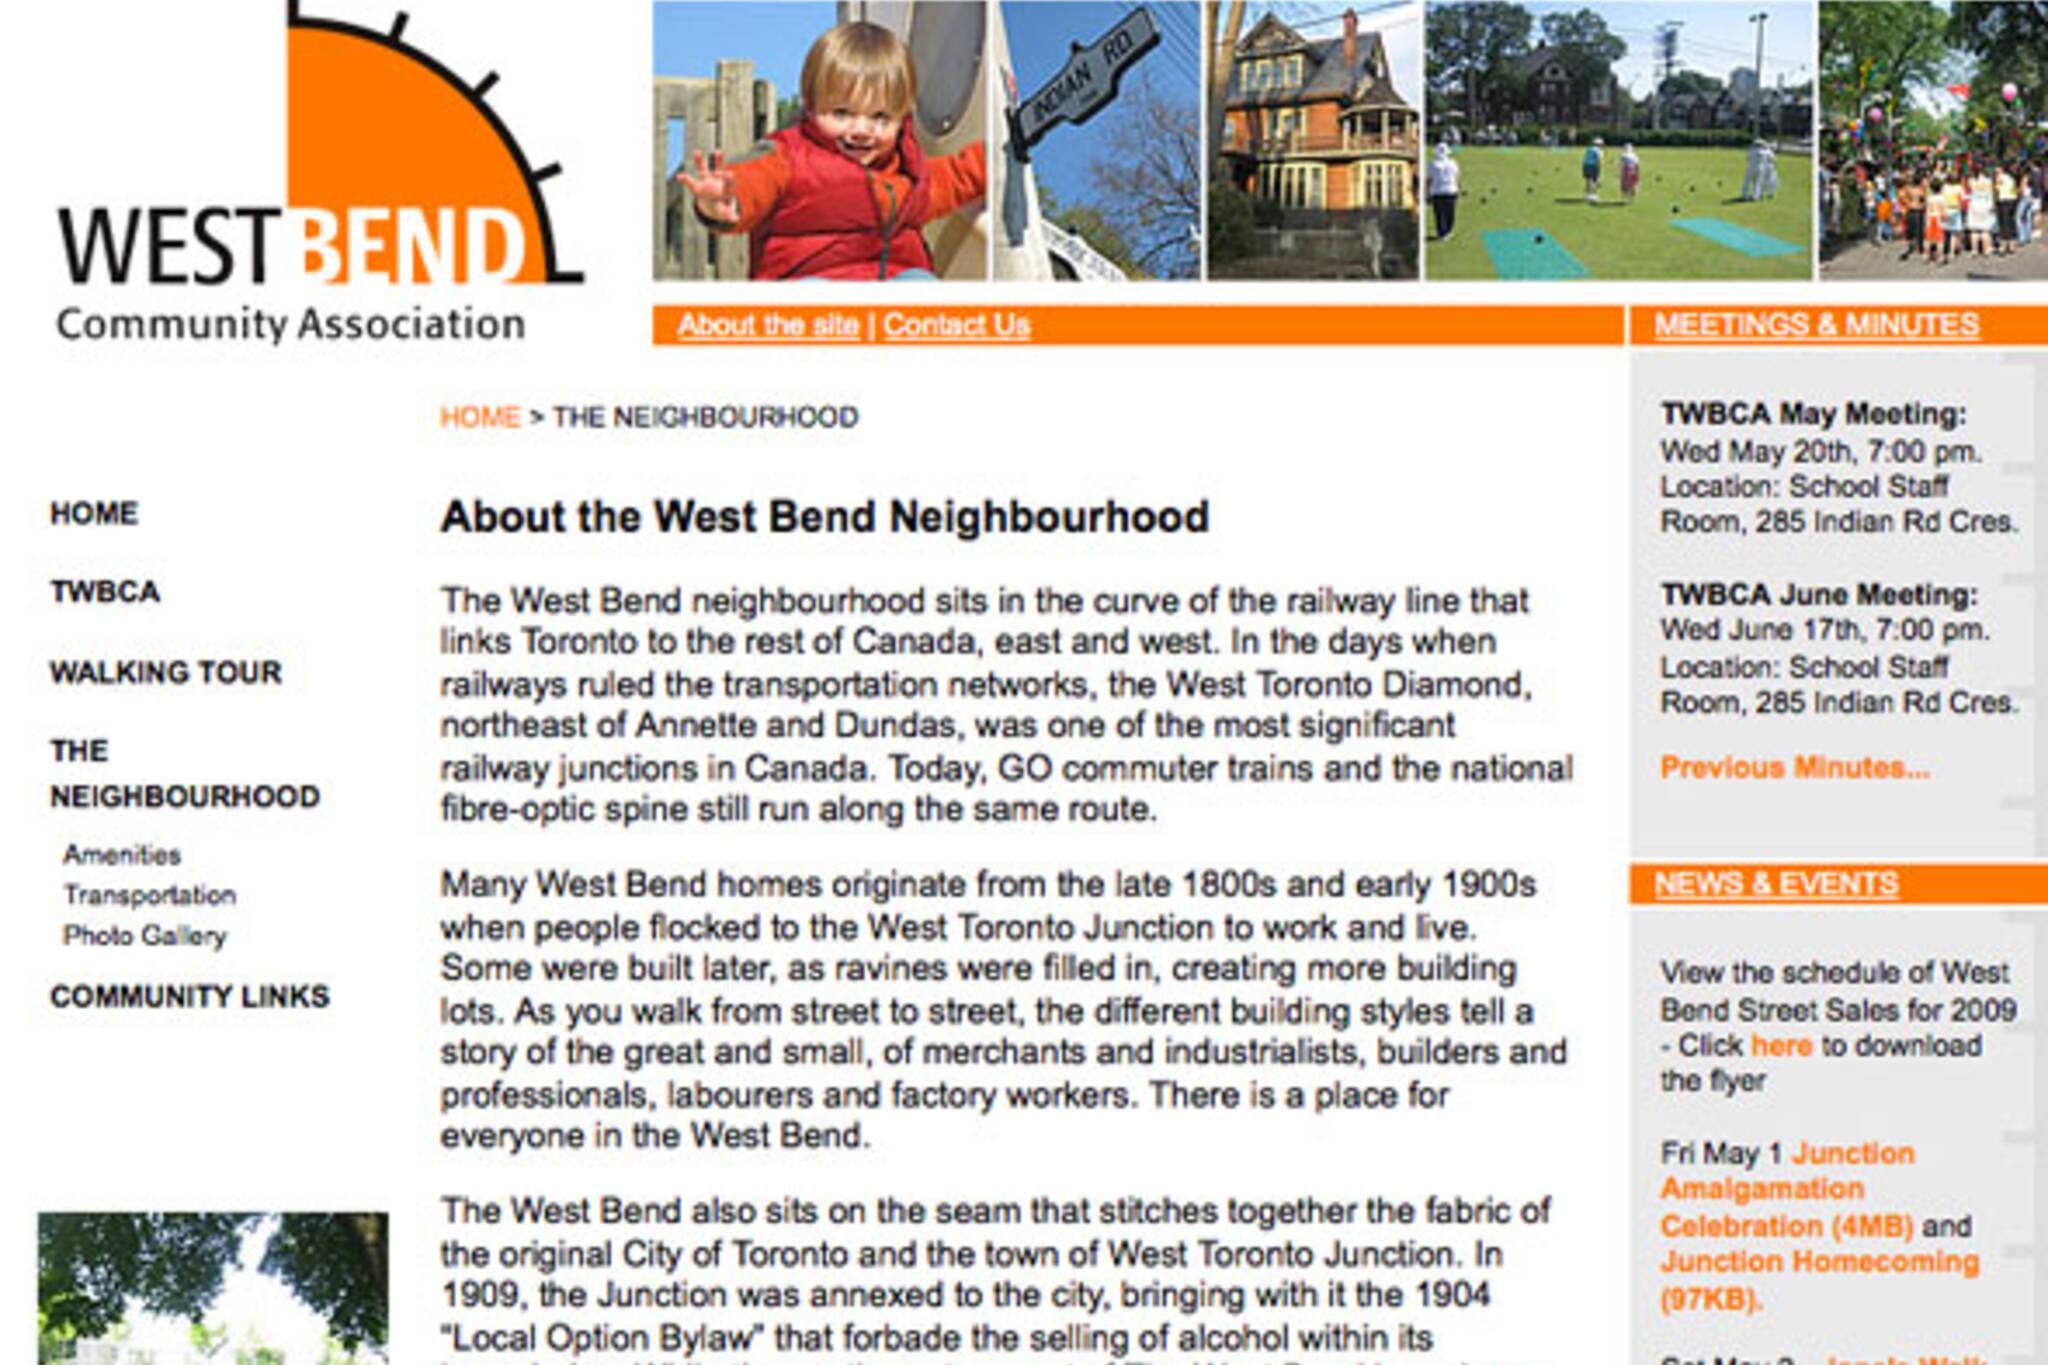 West Bend